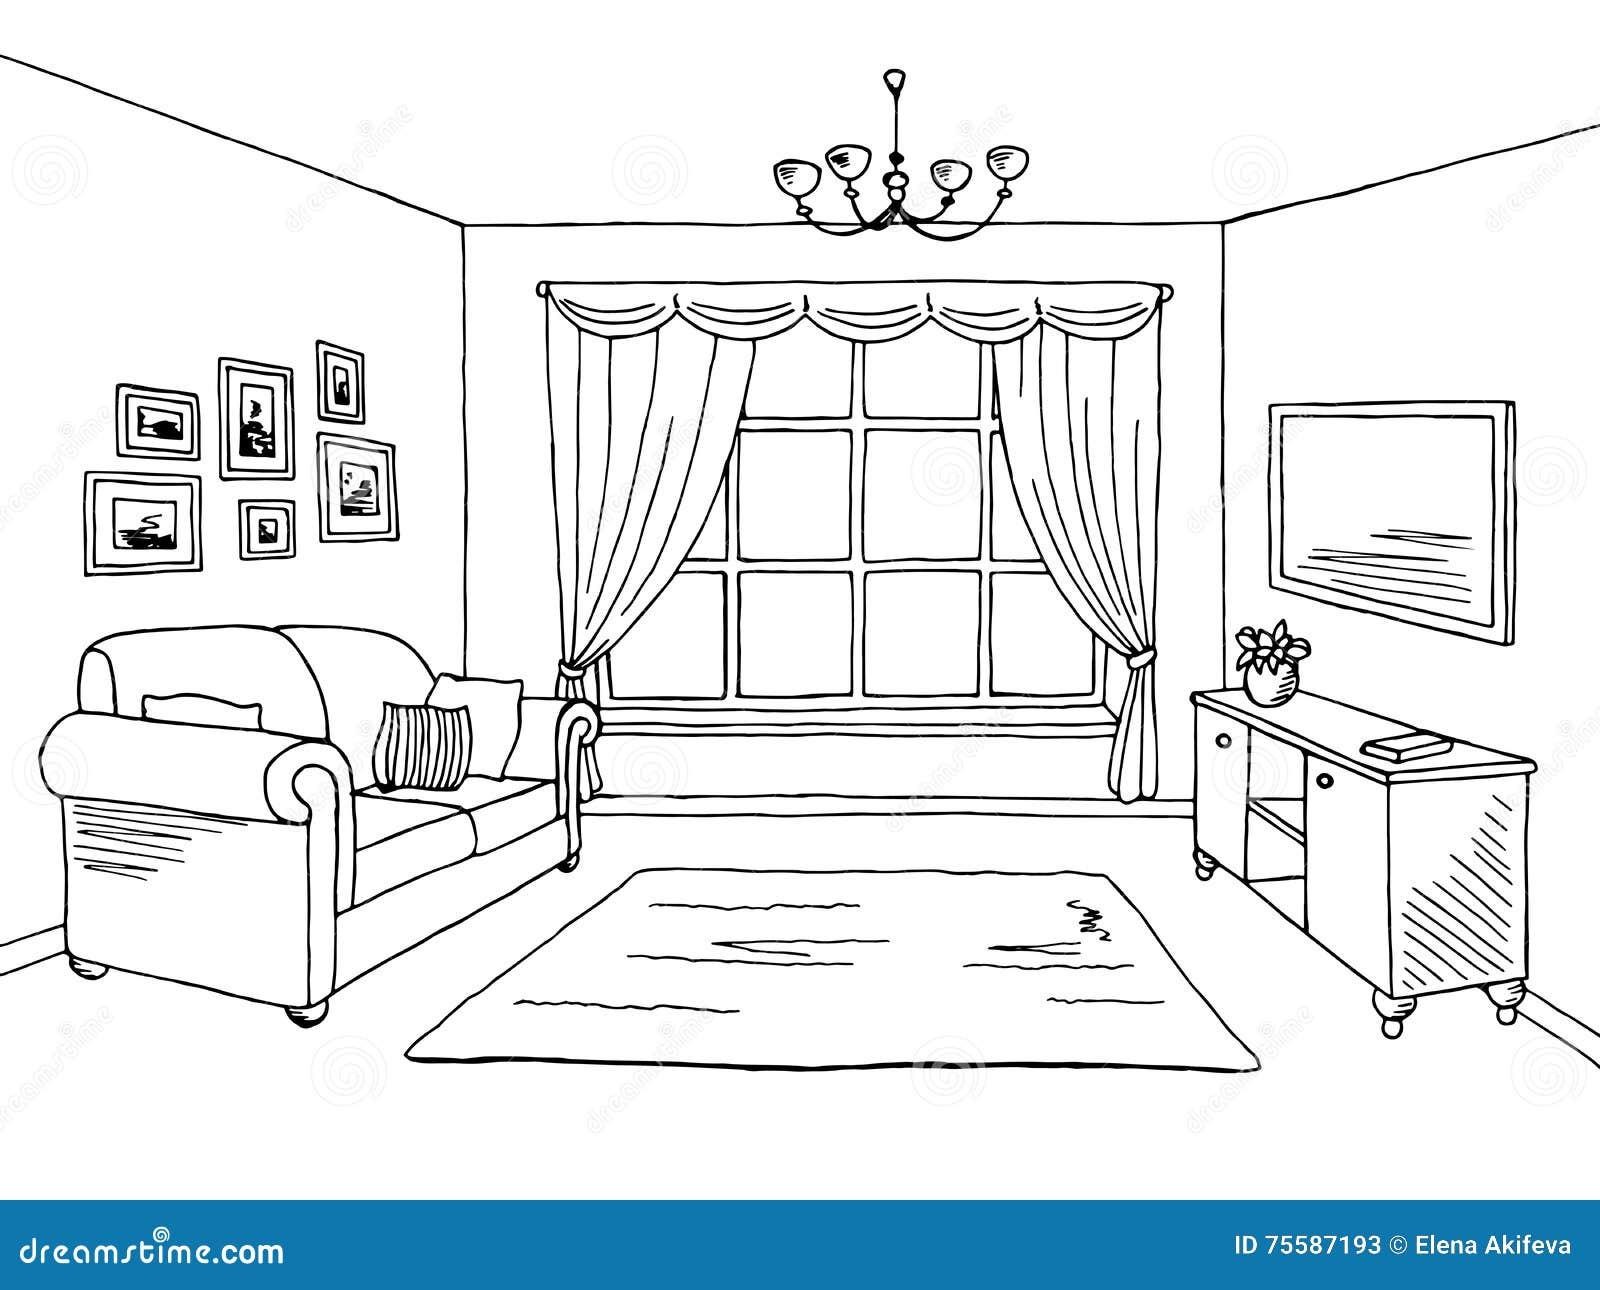 Living Room Sketch Stock Illustrations – 10,10 Living Room Sketch